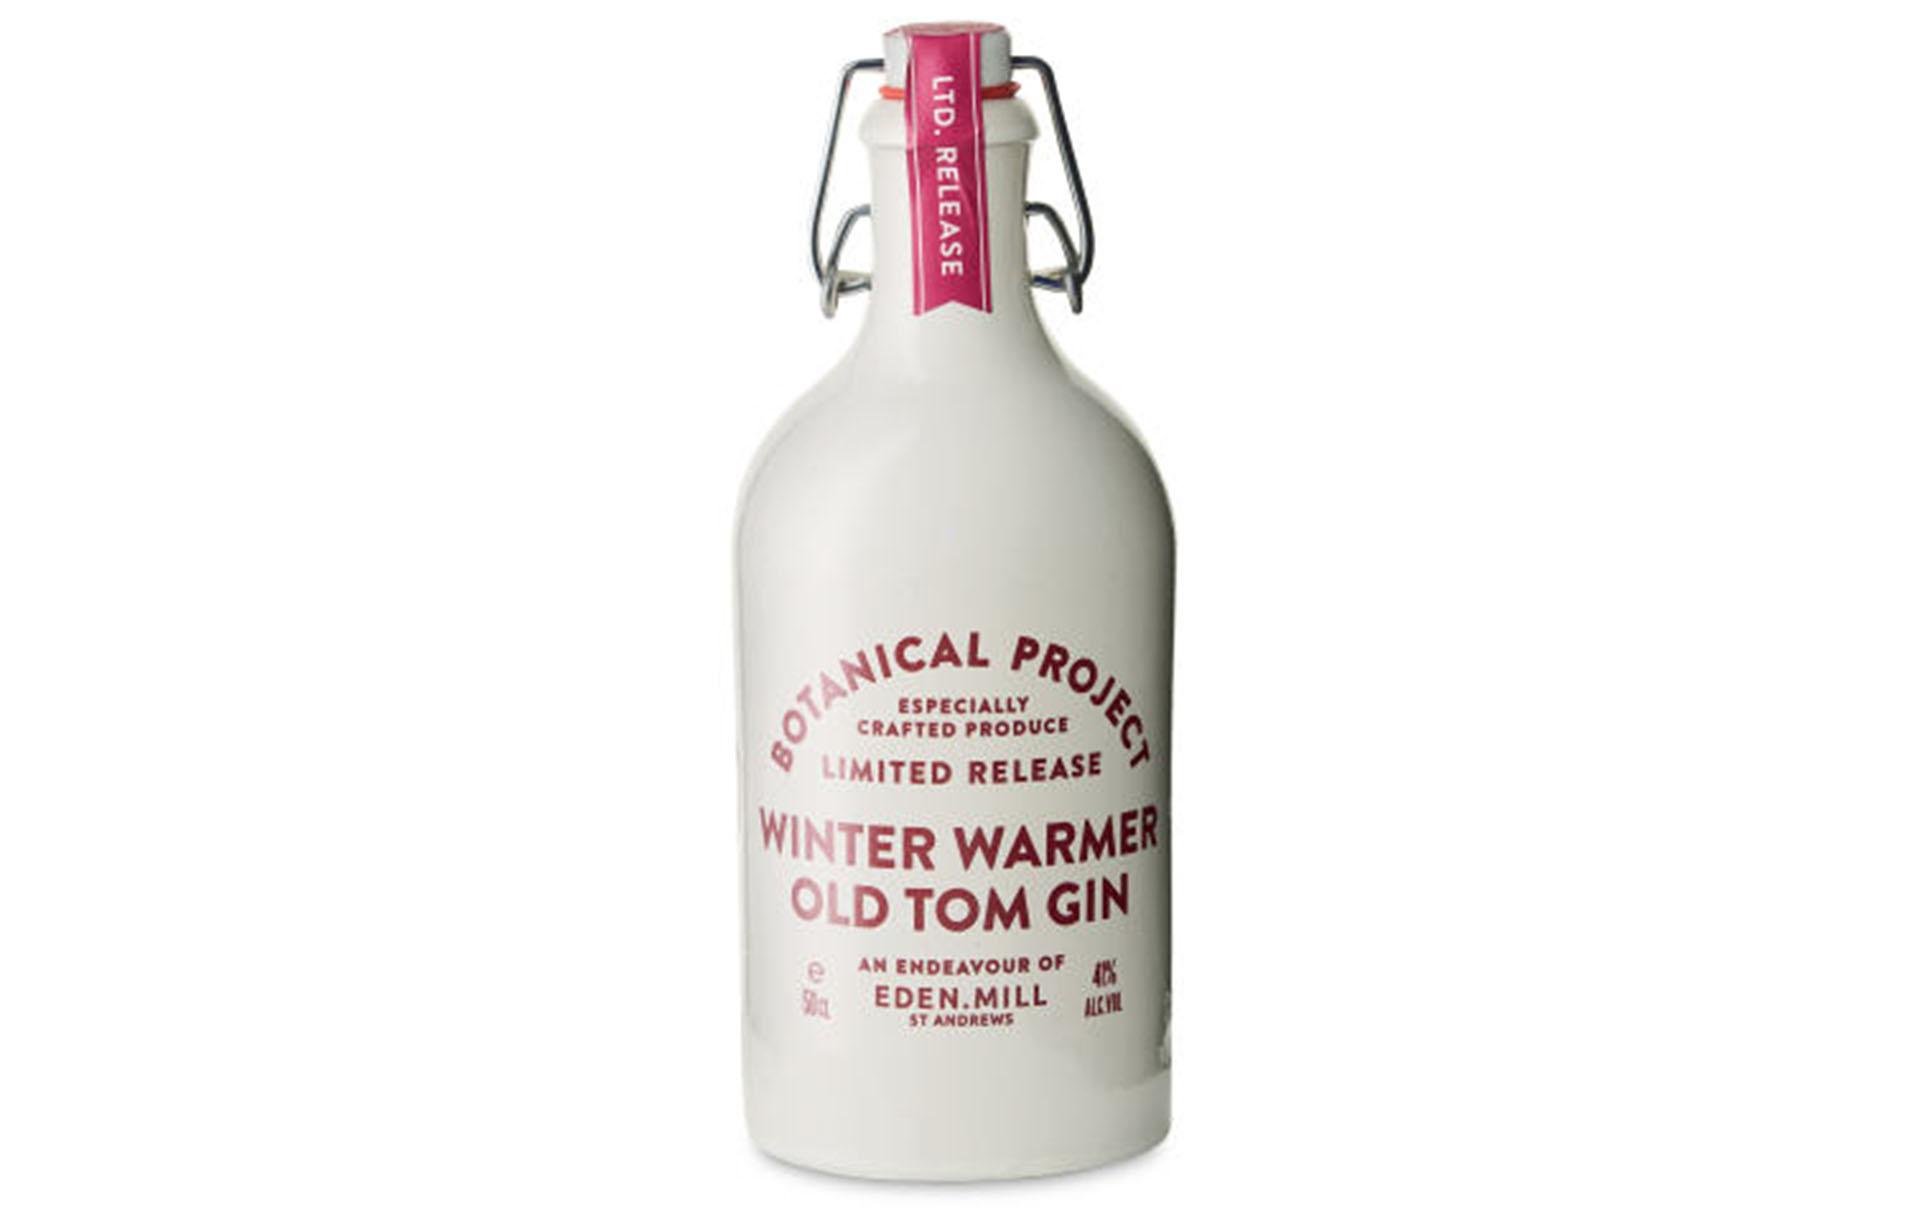 aldi salted caramel and apple gin, aldi winter warmer old tom gin